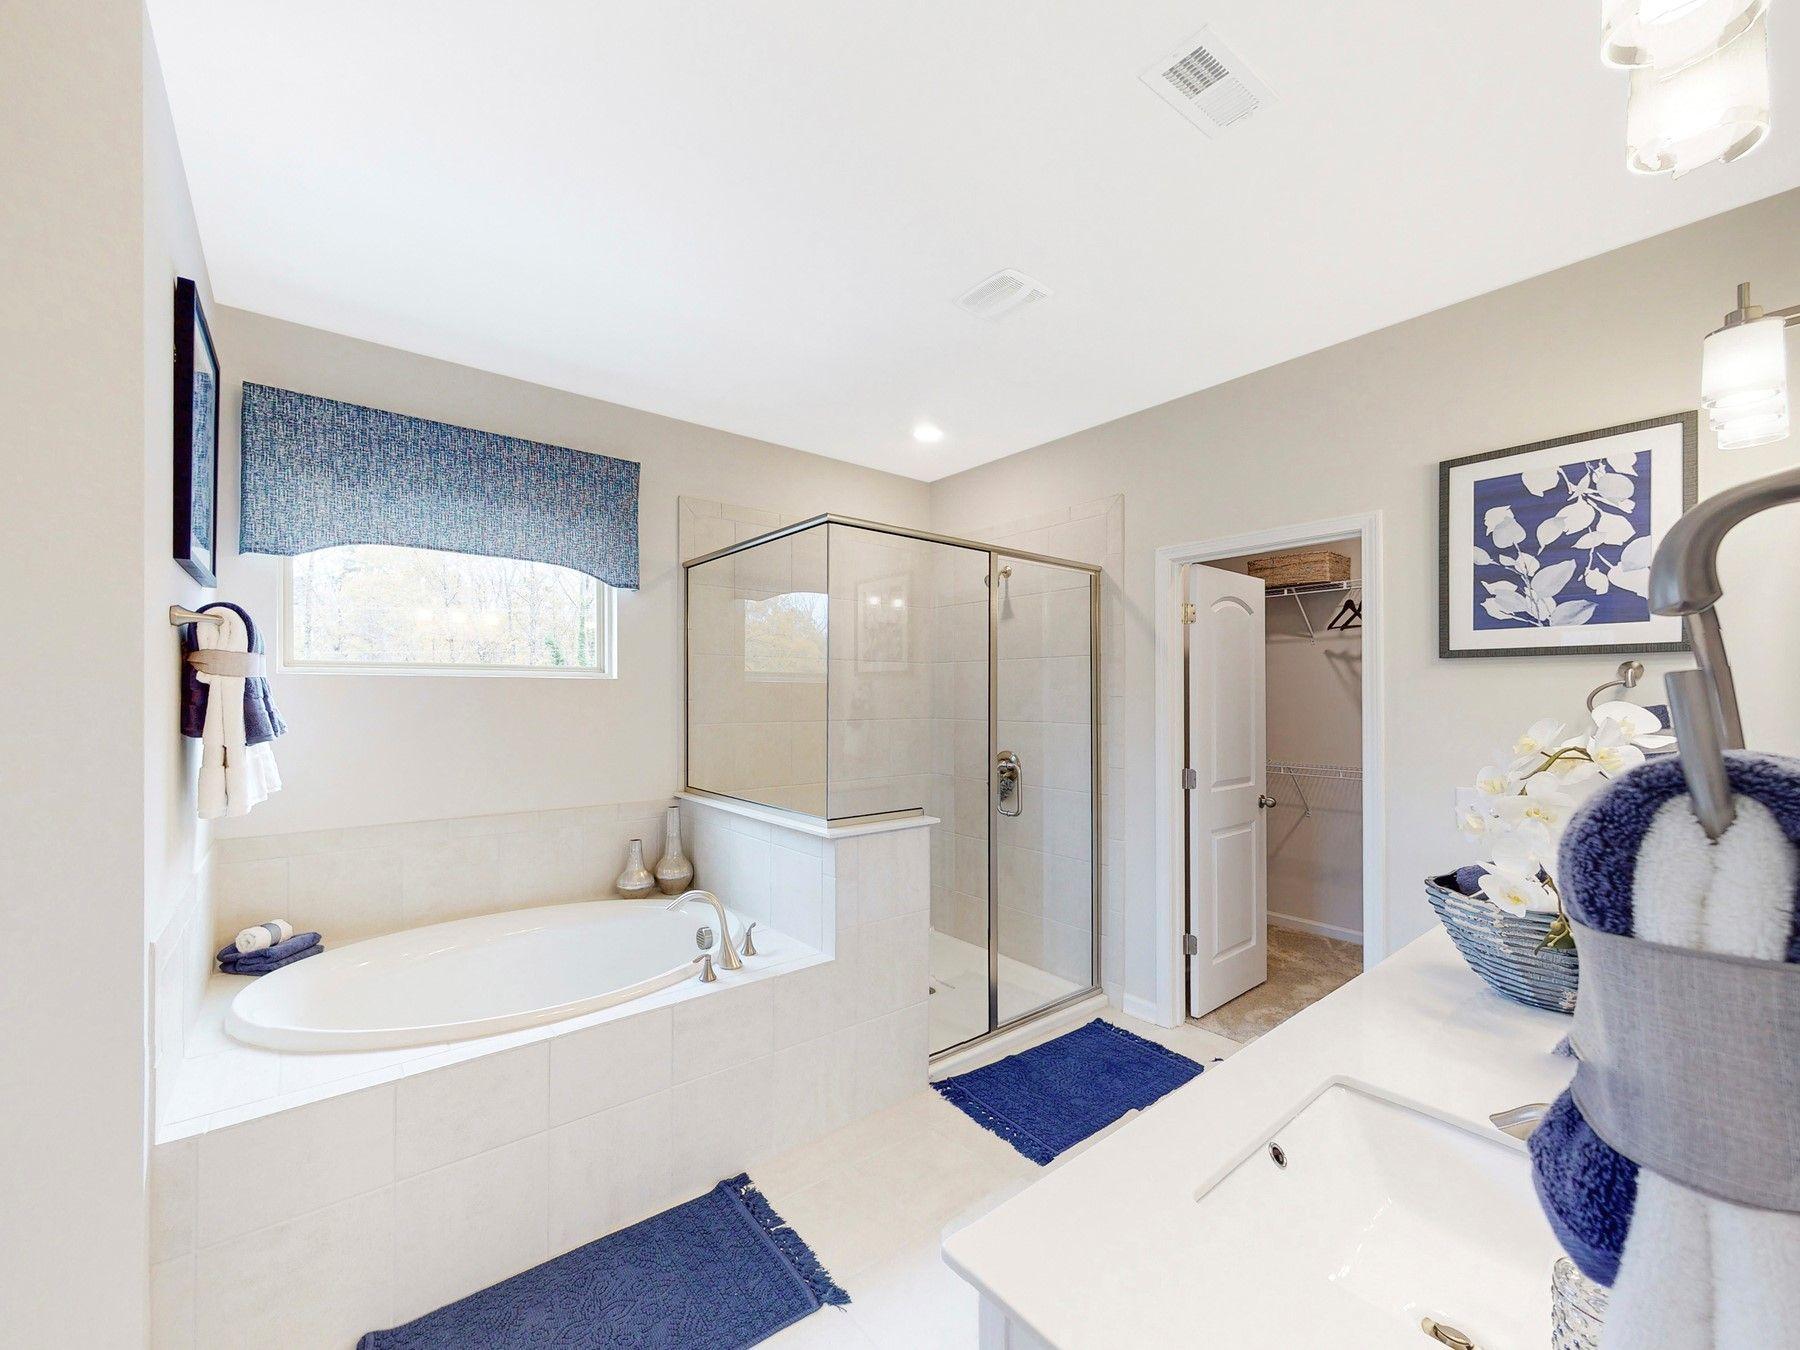 Bathroom featured in the Bridgeport By Century Communities in Charlotte, SC